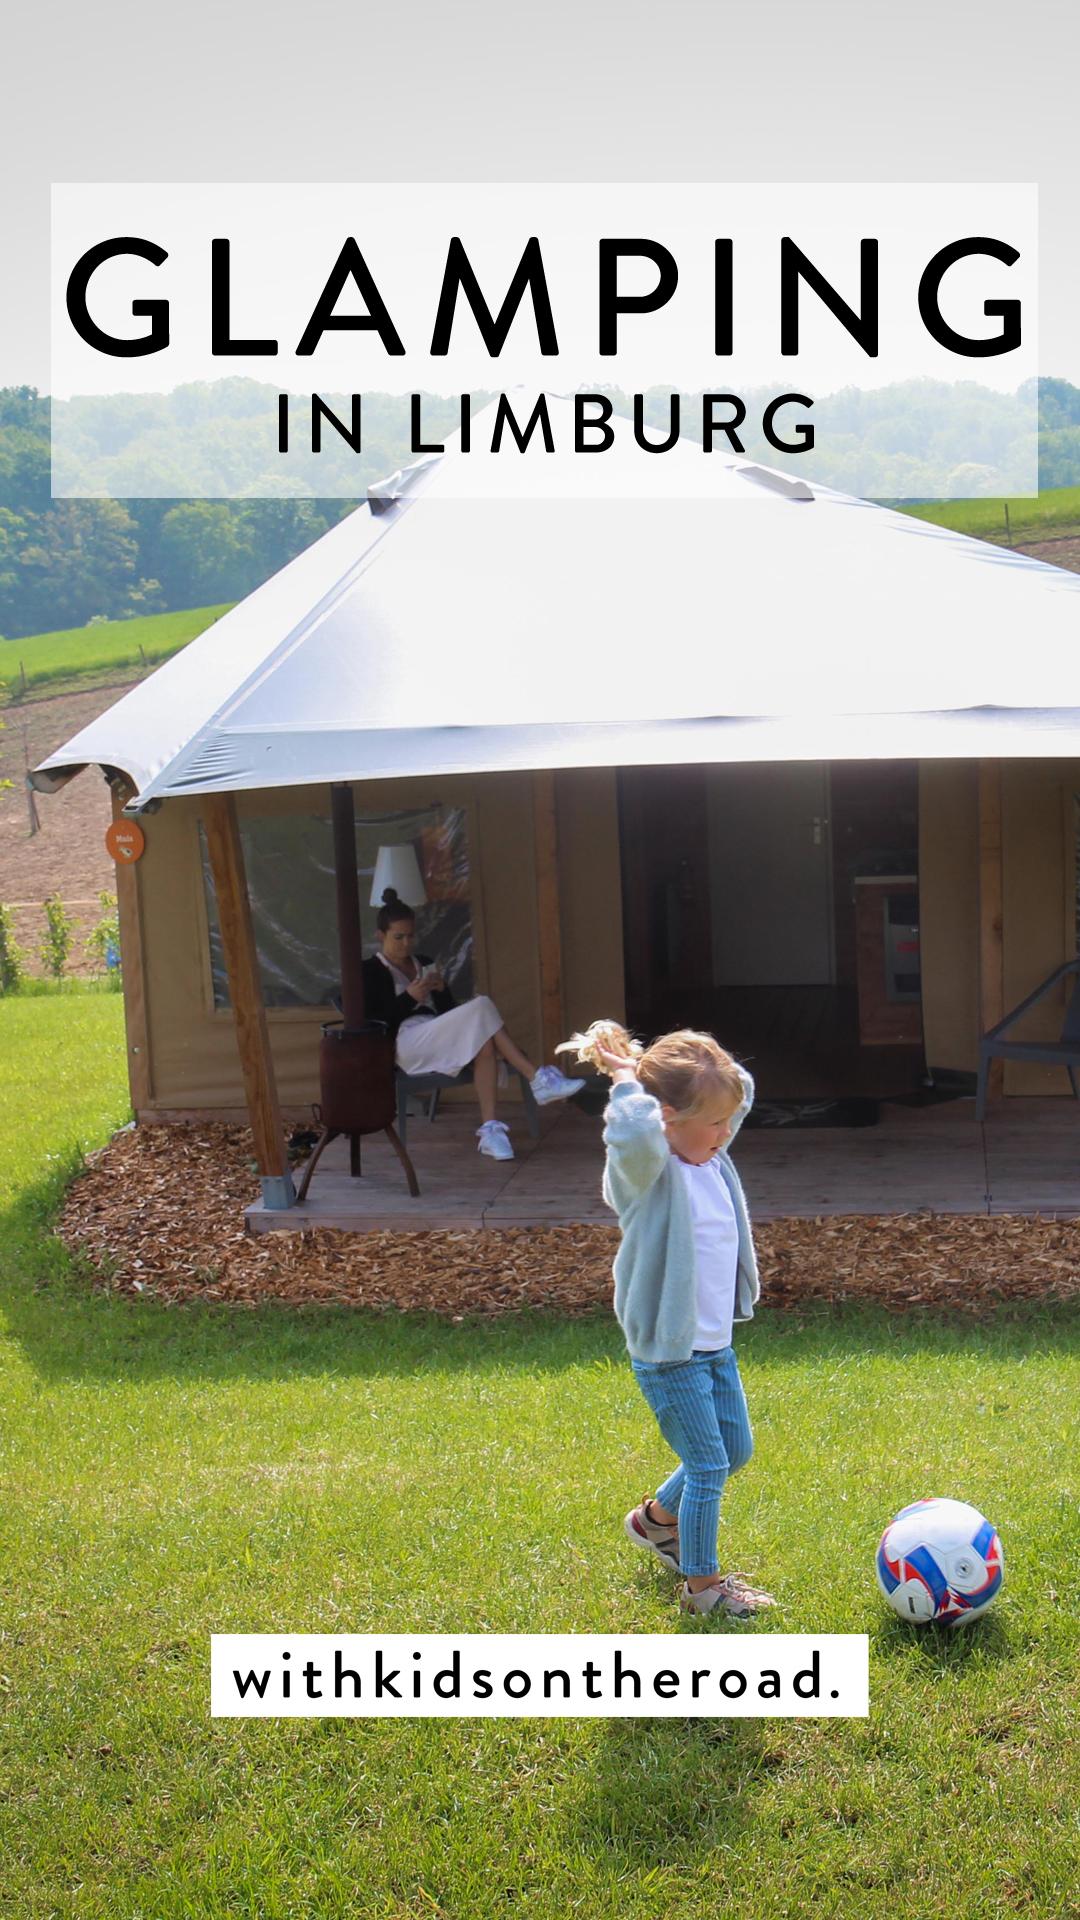 Glamping - in Limburg.jpg